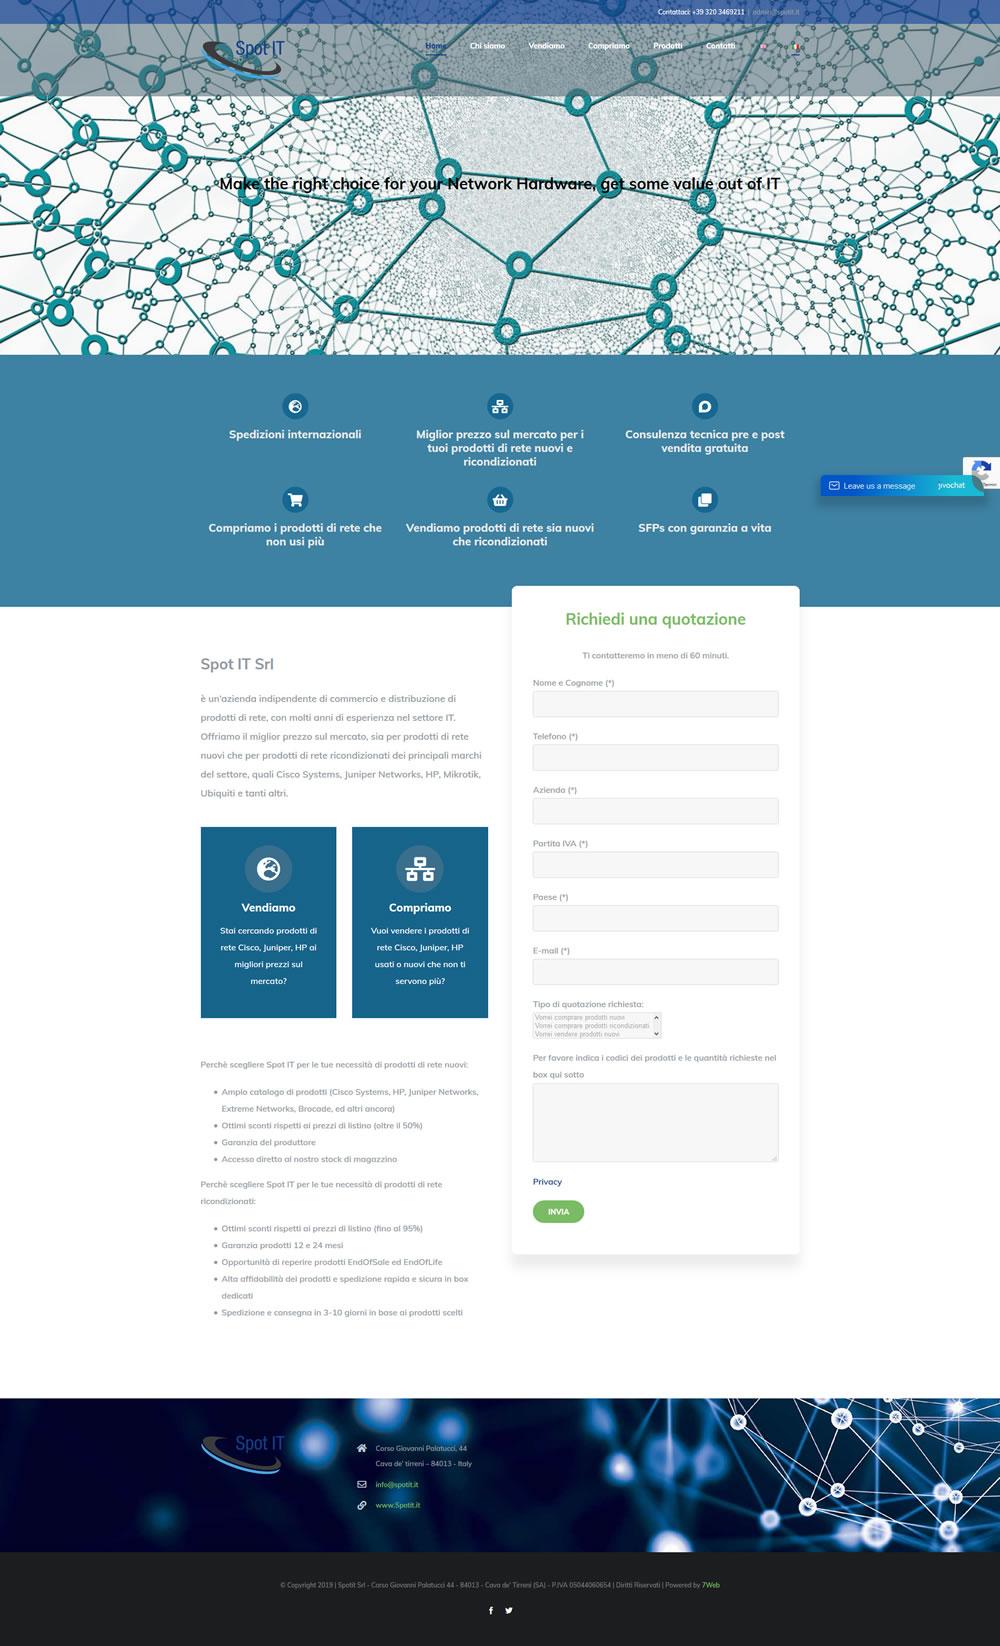 Spot IT - Setteweb.it Portfolio Sito Web WordPress 7Web-2019